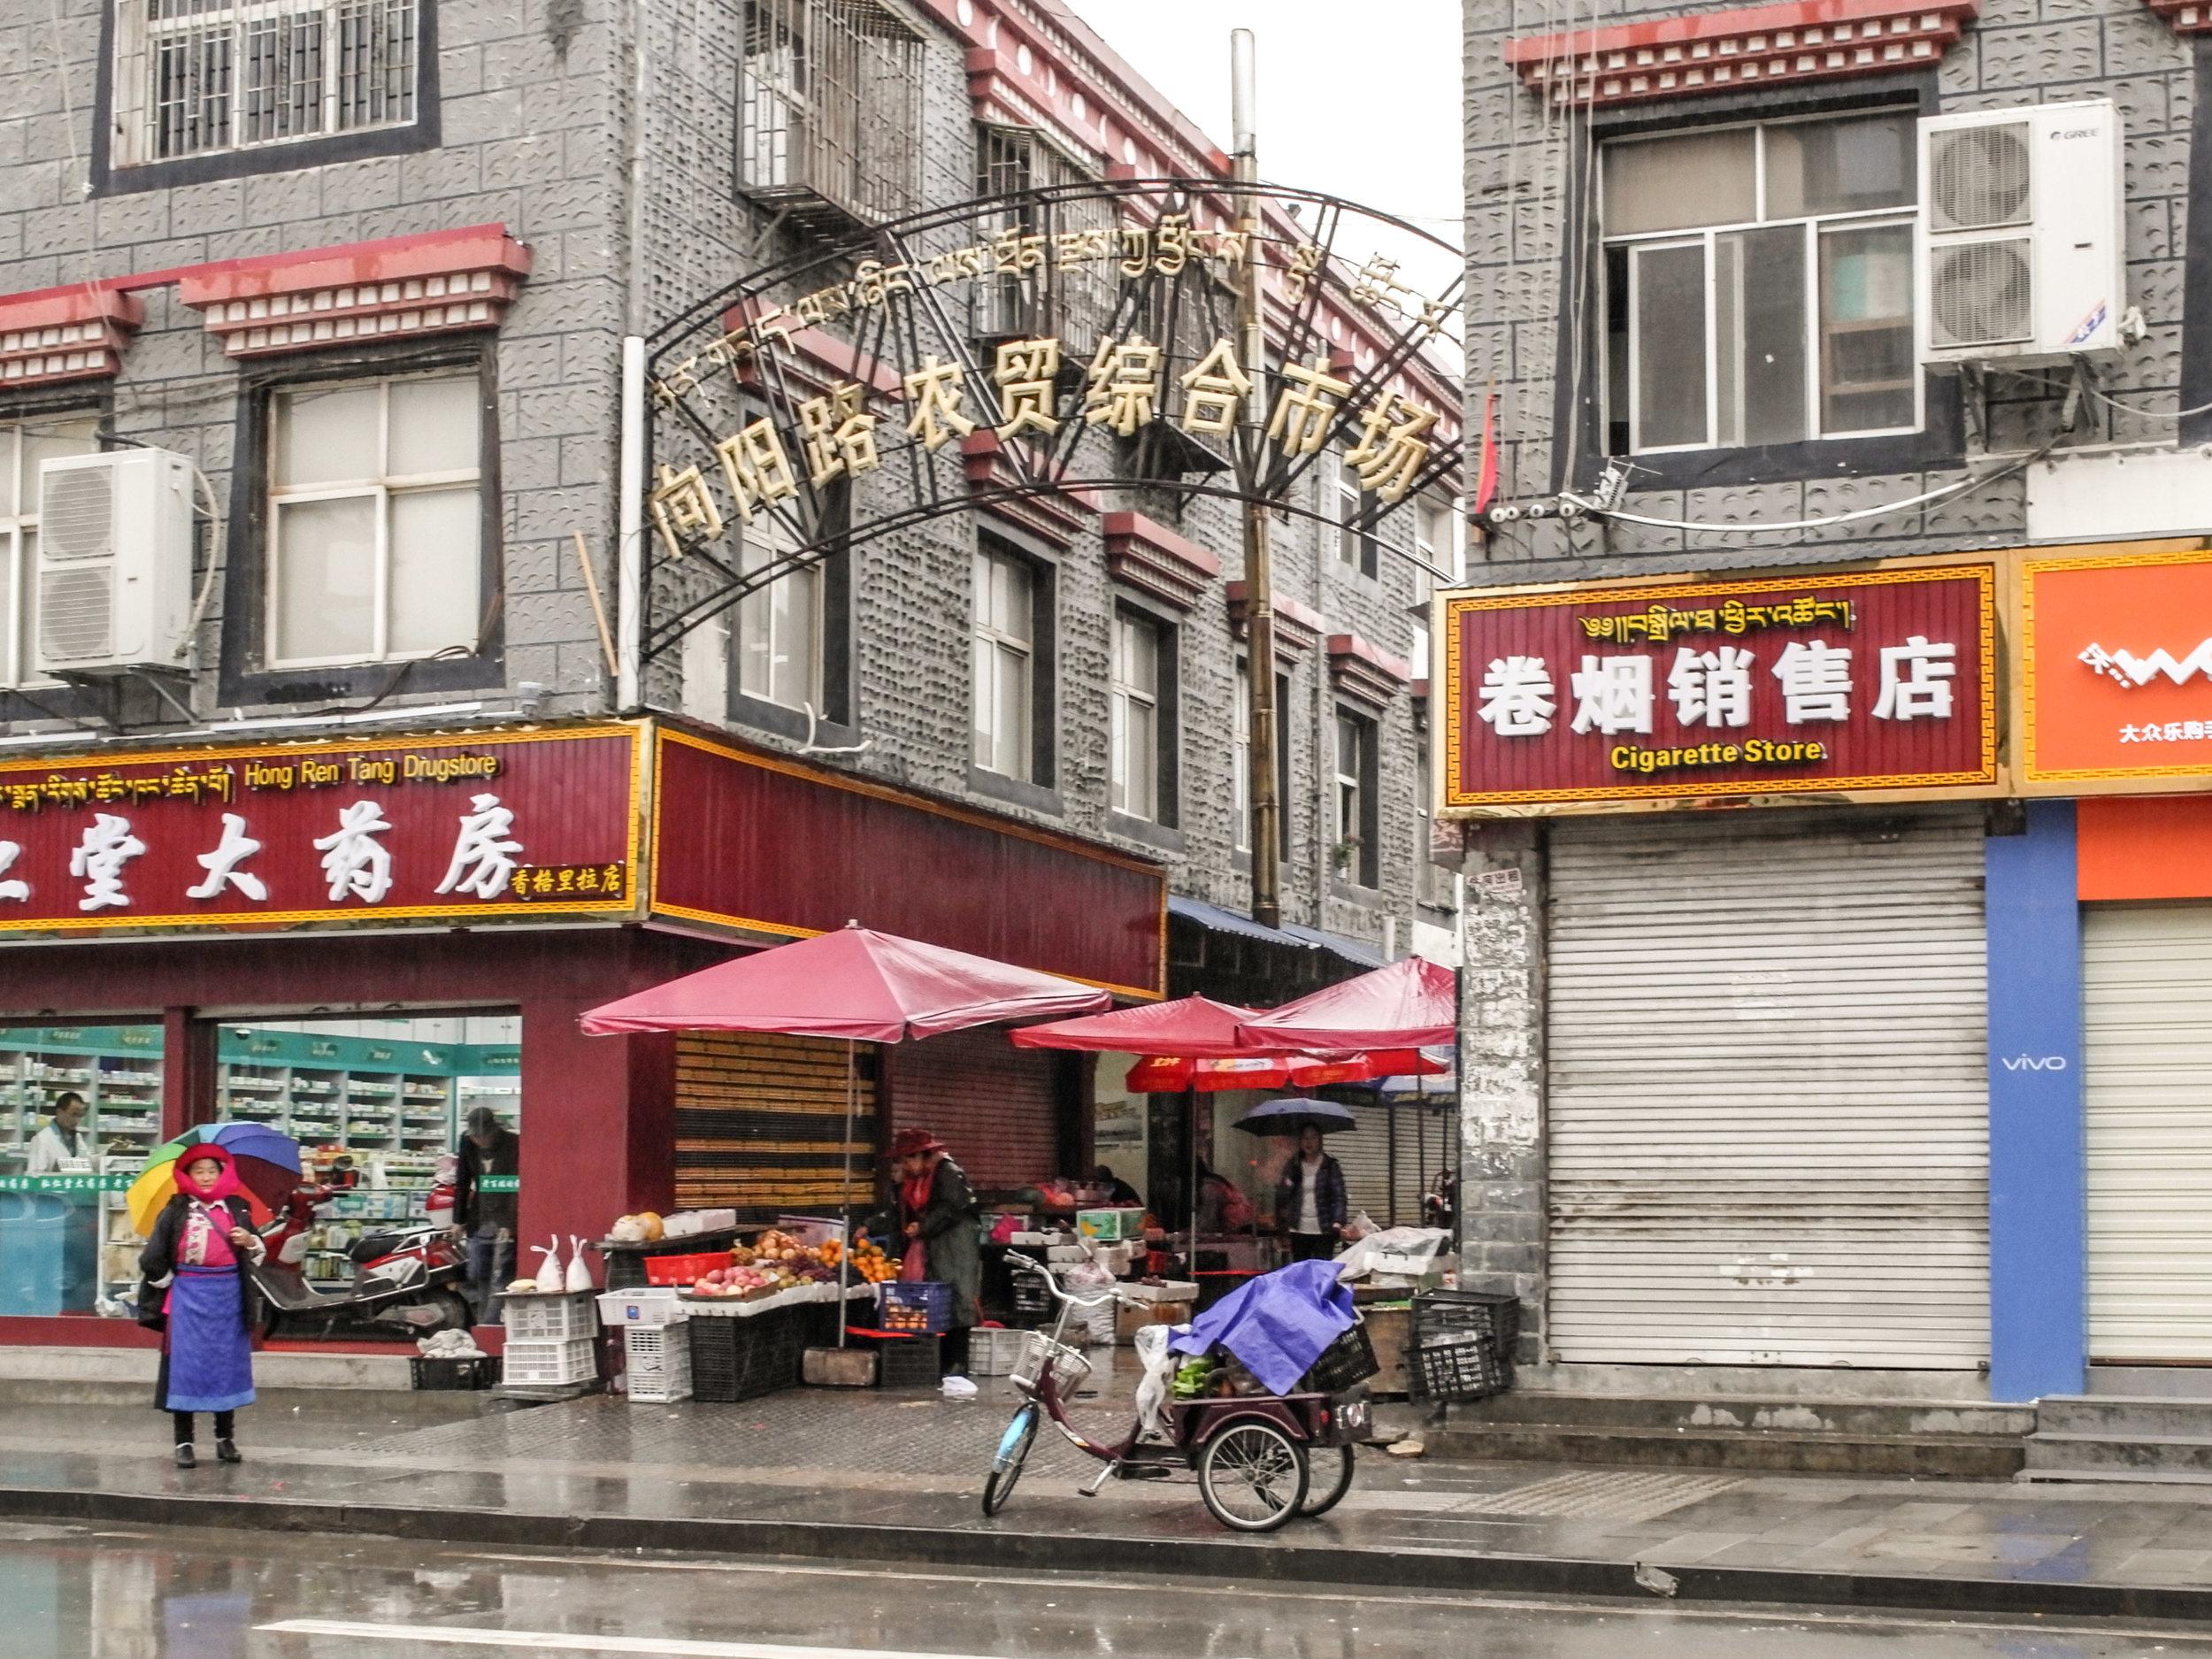 the market entrance